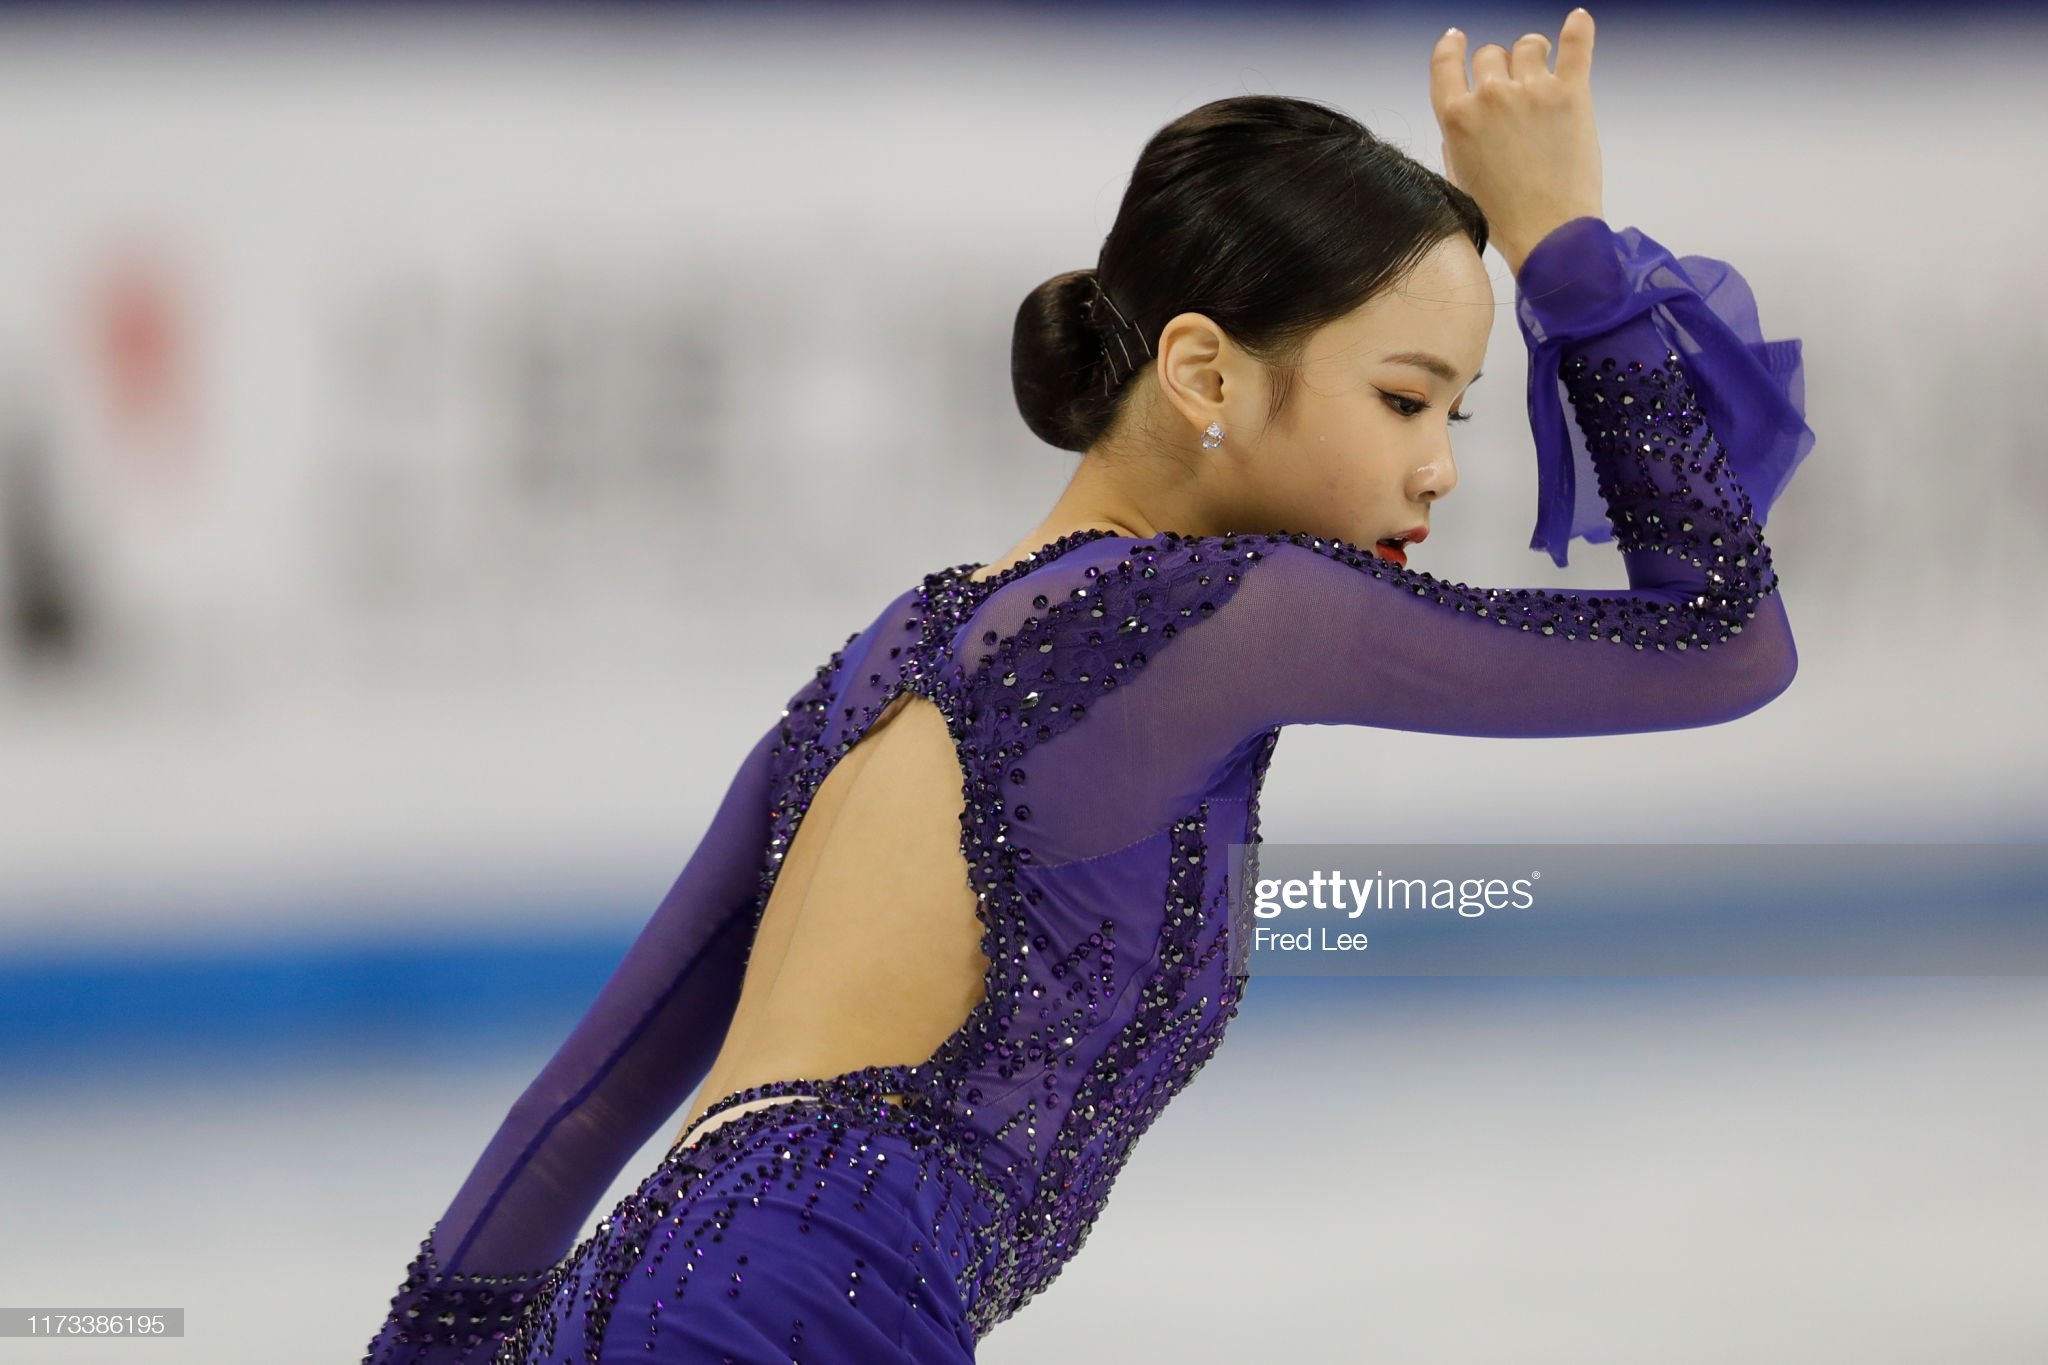 Shanghai Trophy (Invitational). 3-5 октября 2019. Шанхай (Китай) - Страница 3 Eunsoo-lim-of-korea-competes-in-the-ladies-short-program-during-the-picture-id1173386195?s=2048x2048